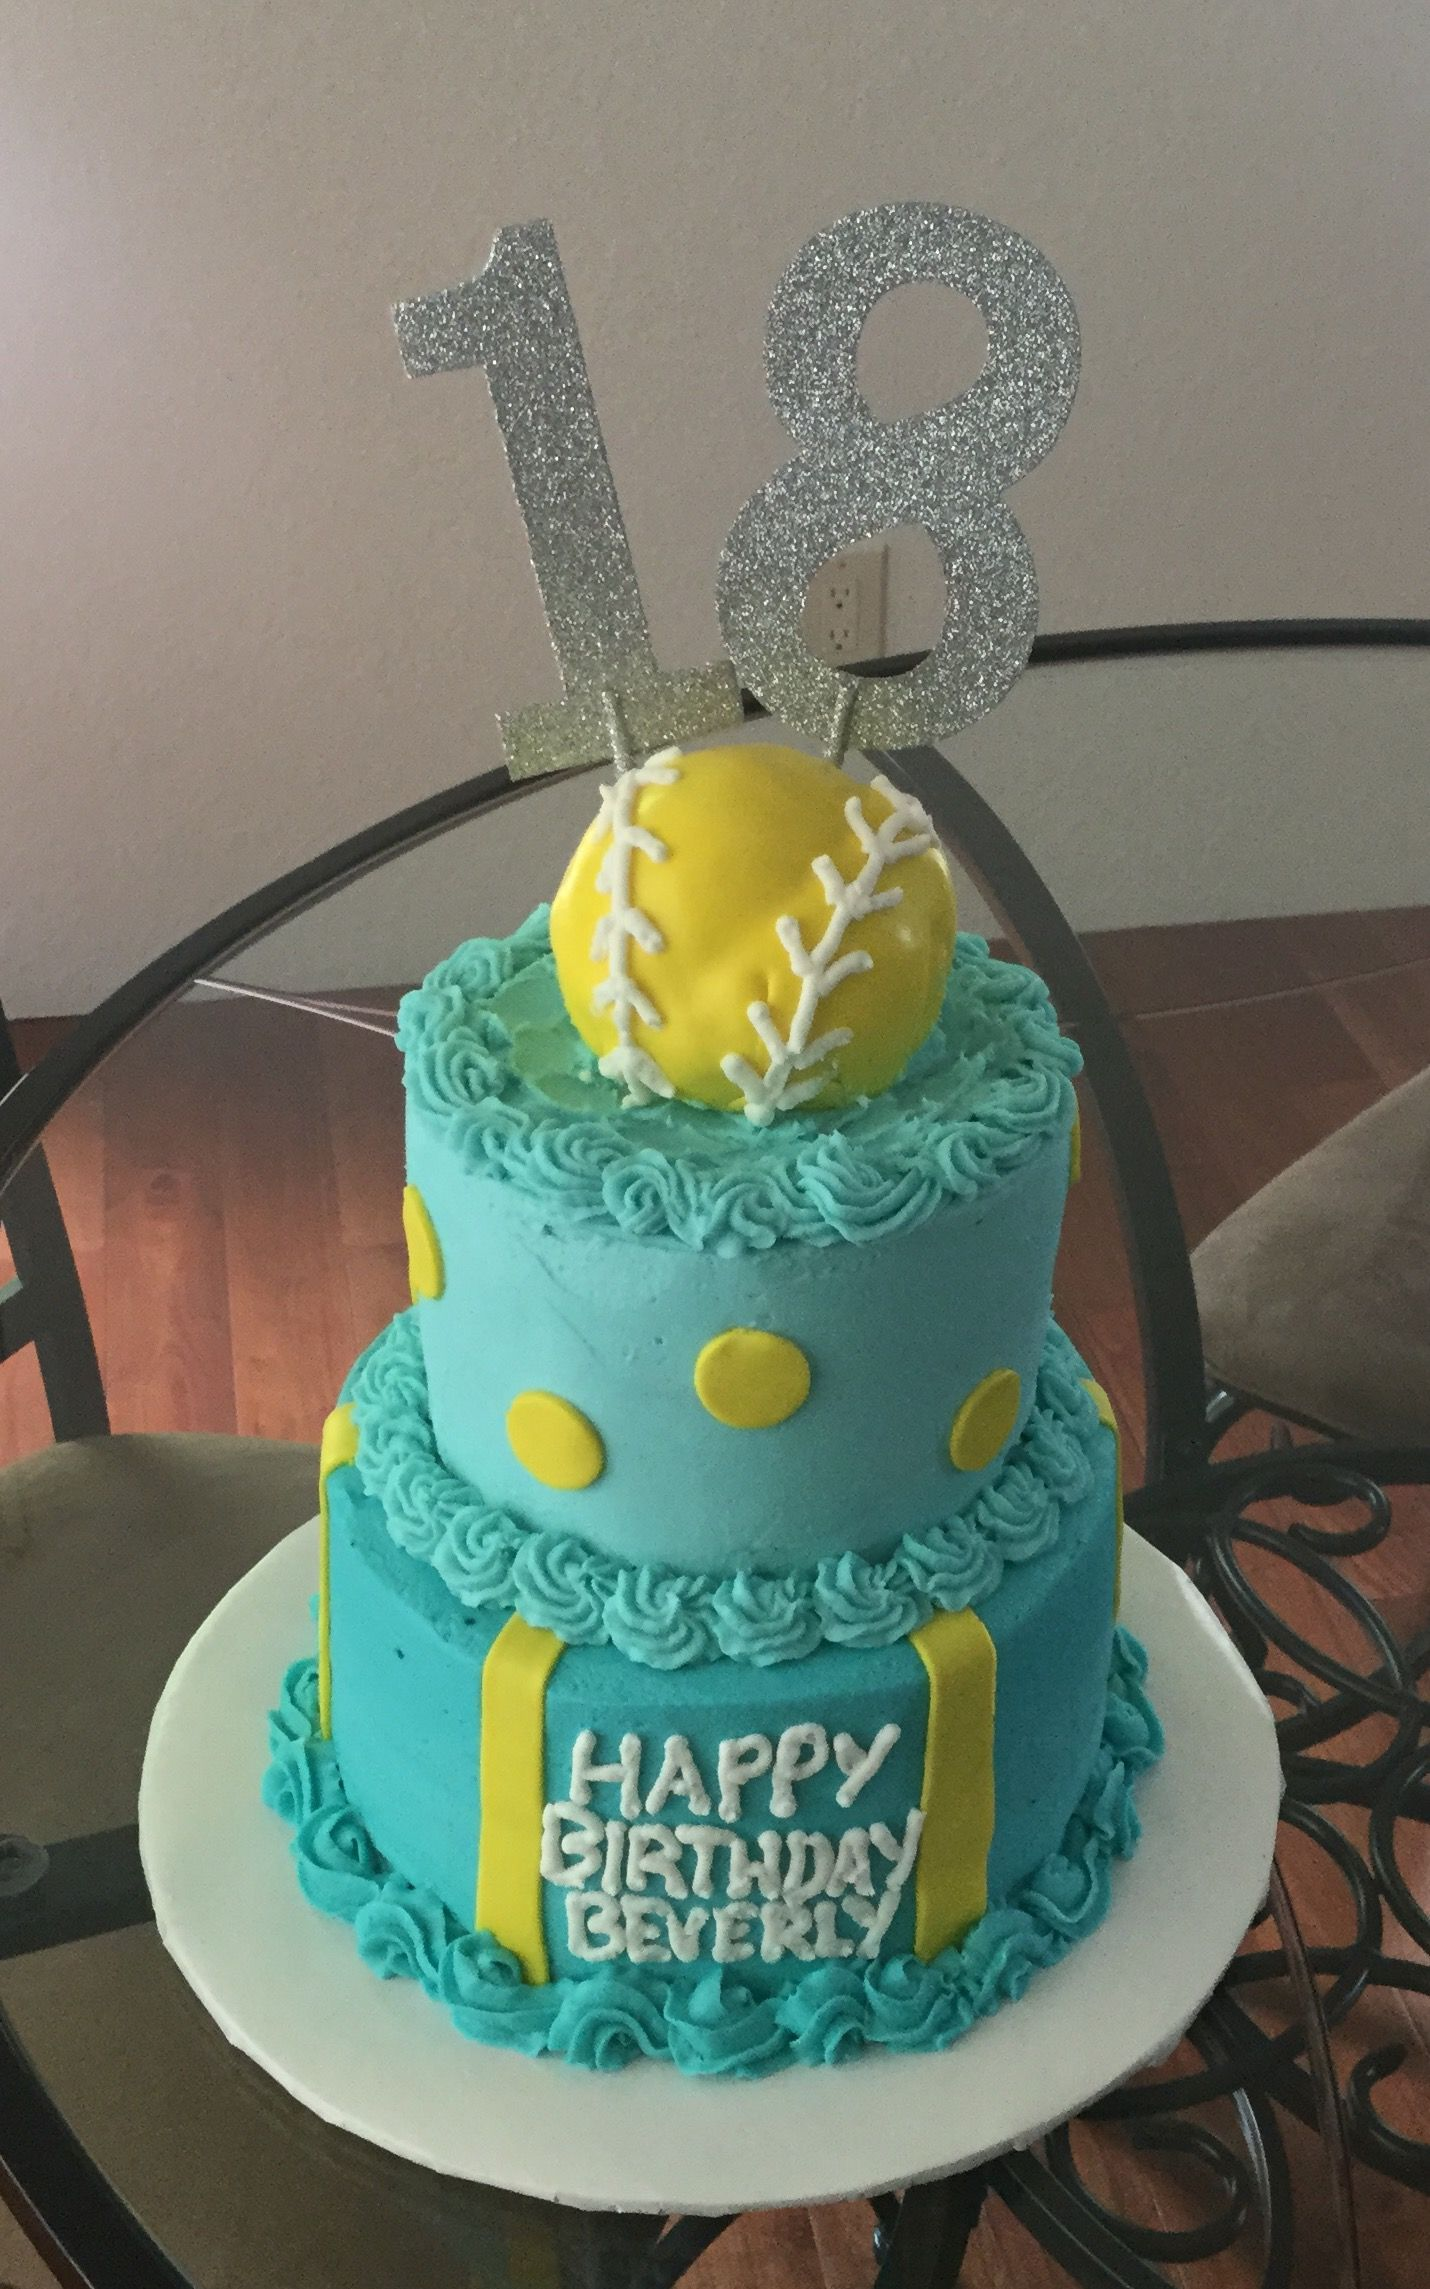 Surprising Softball Birthday Cake Handmade By Cindy Babich 2016 With Personalised Birthday Cards Paralily Jamesorg